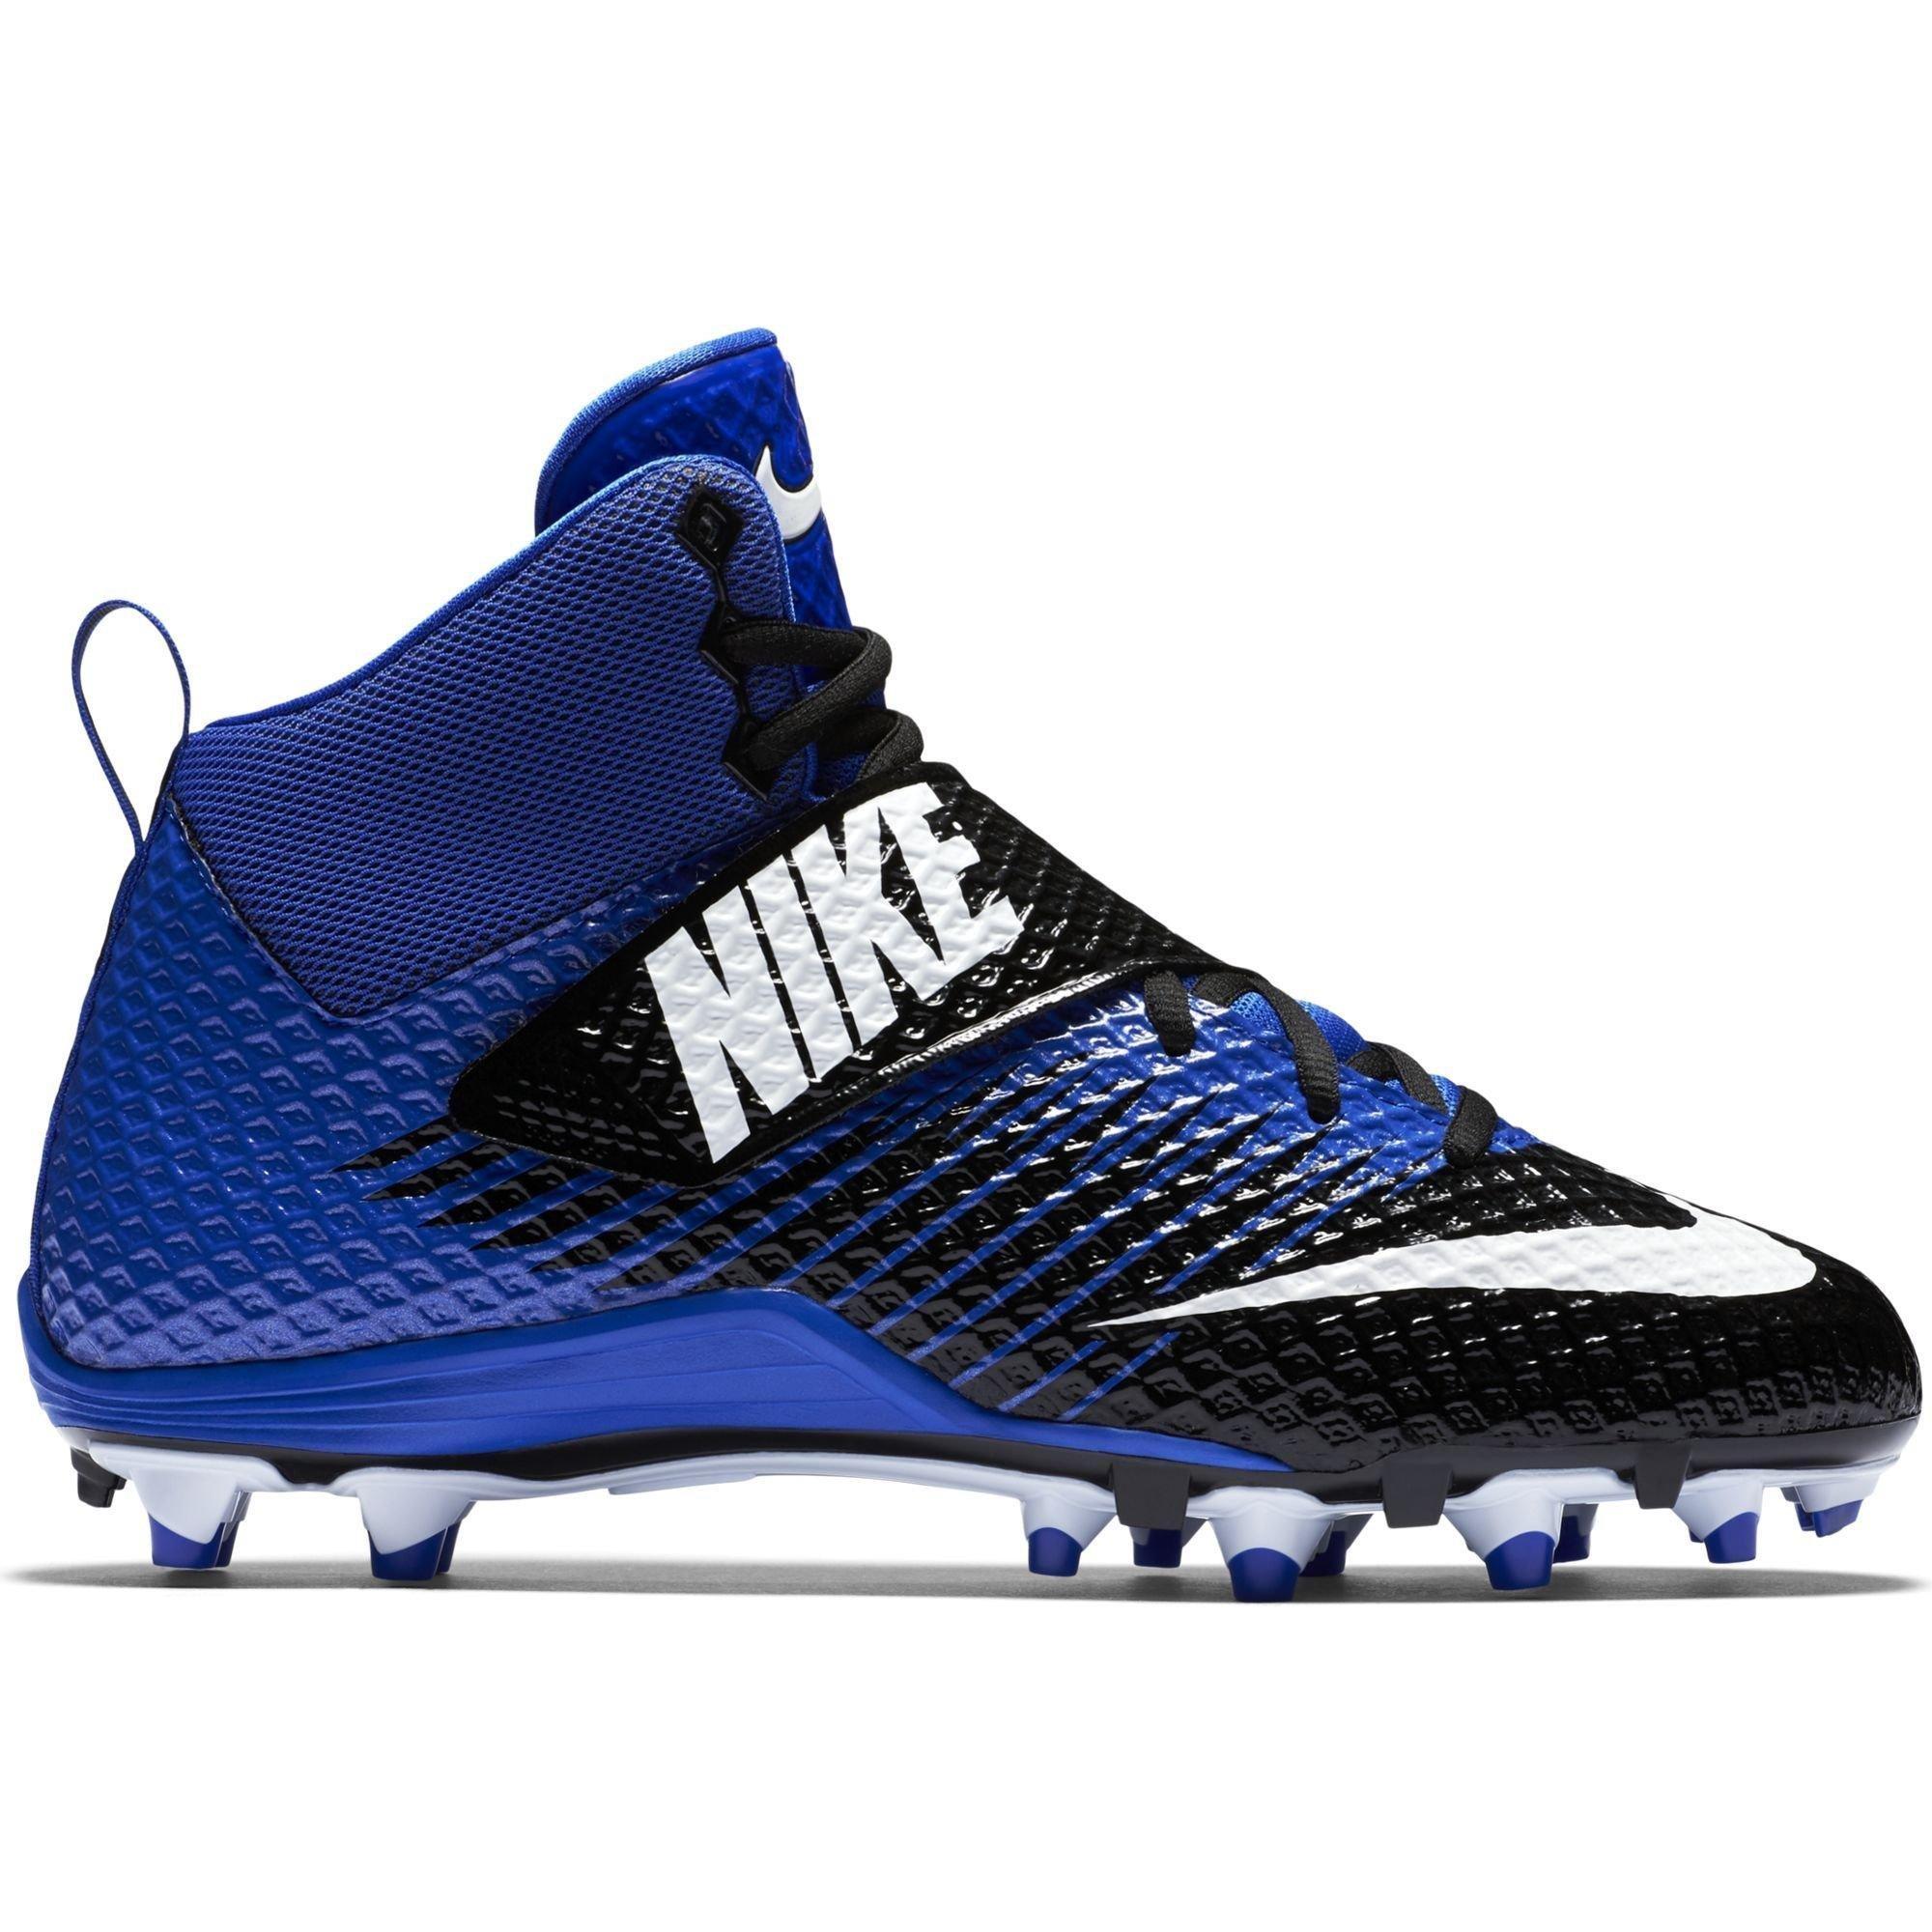 Nike Men's Lunarbeast Pro TD Football Cleat Black/Racer Blue/White Size 10 M US